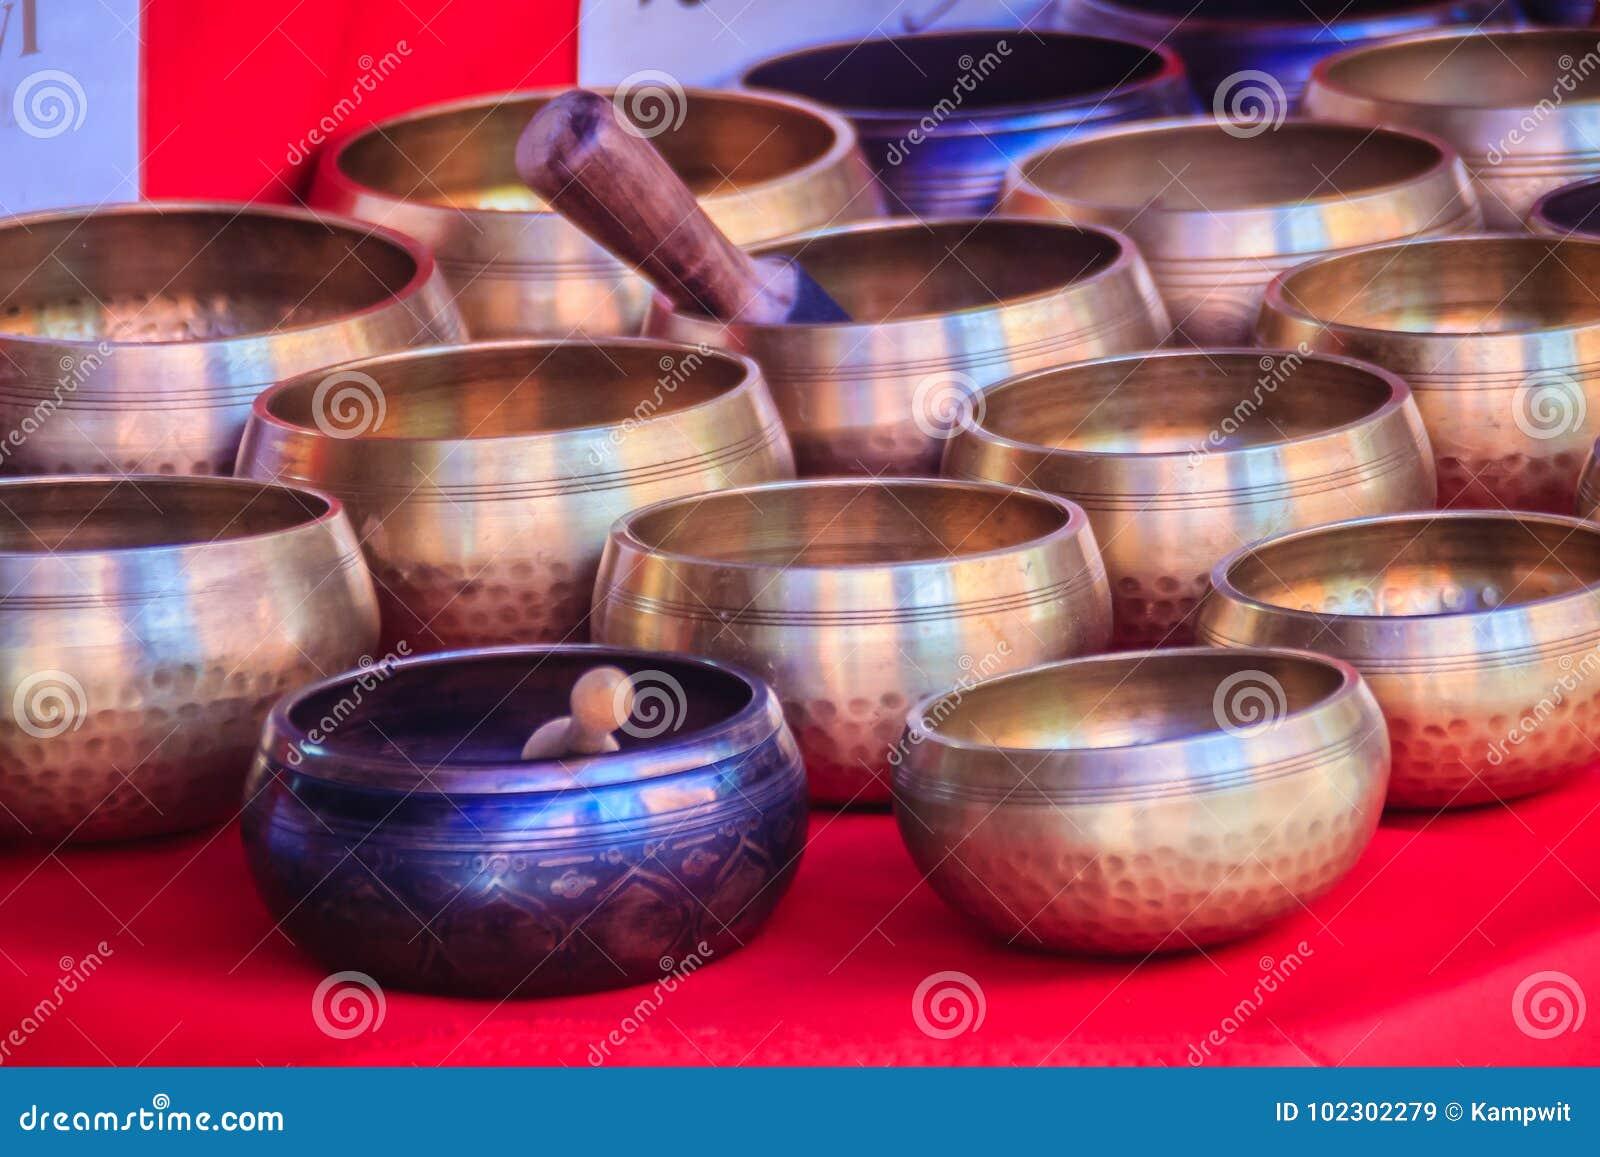 Tibetan Singing Bowls For Sale At The Antique Market ...